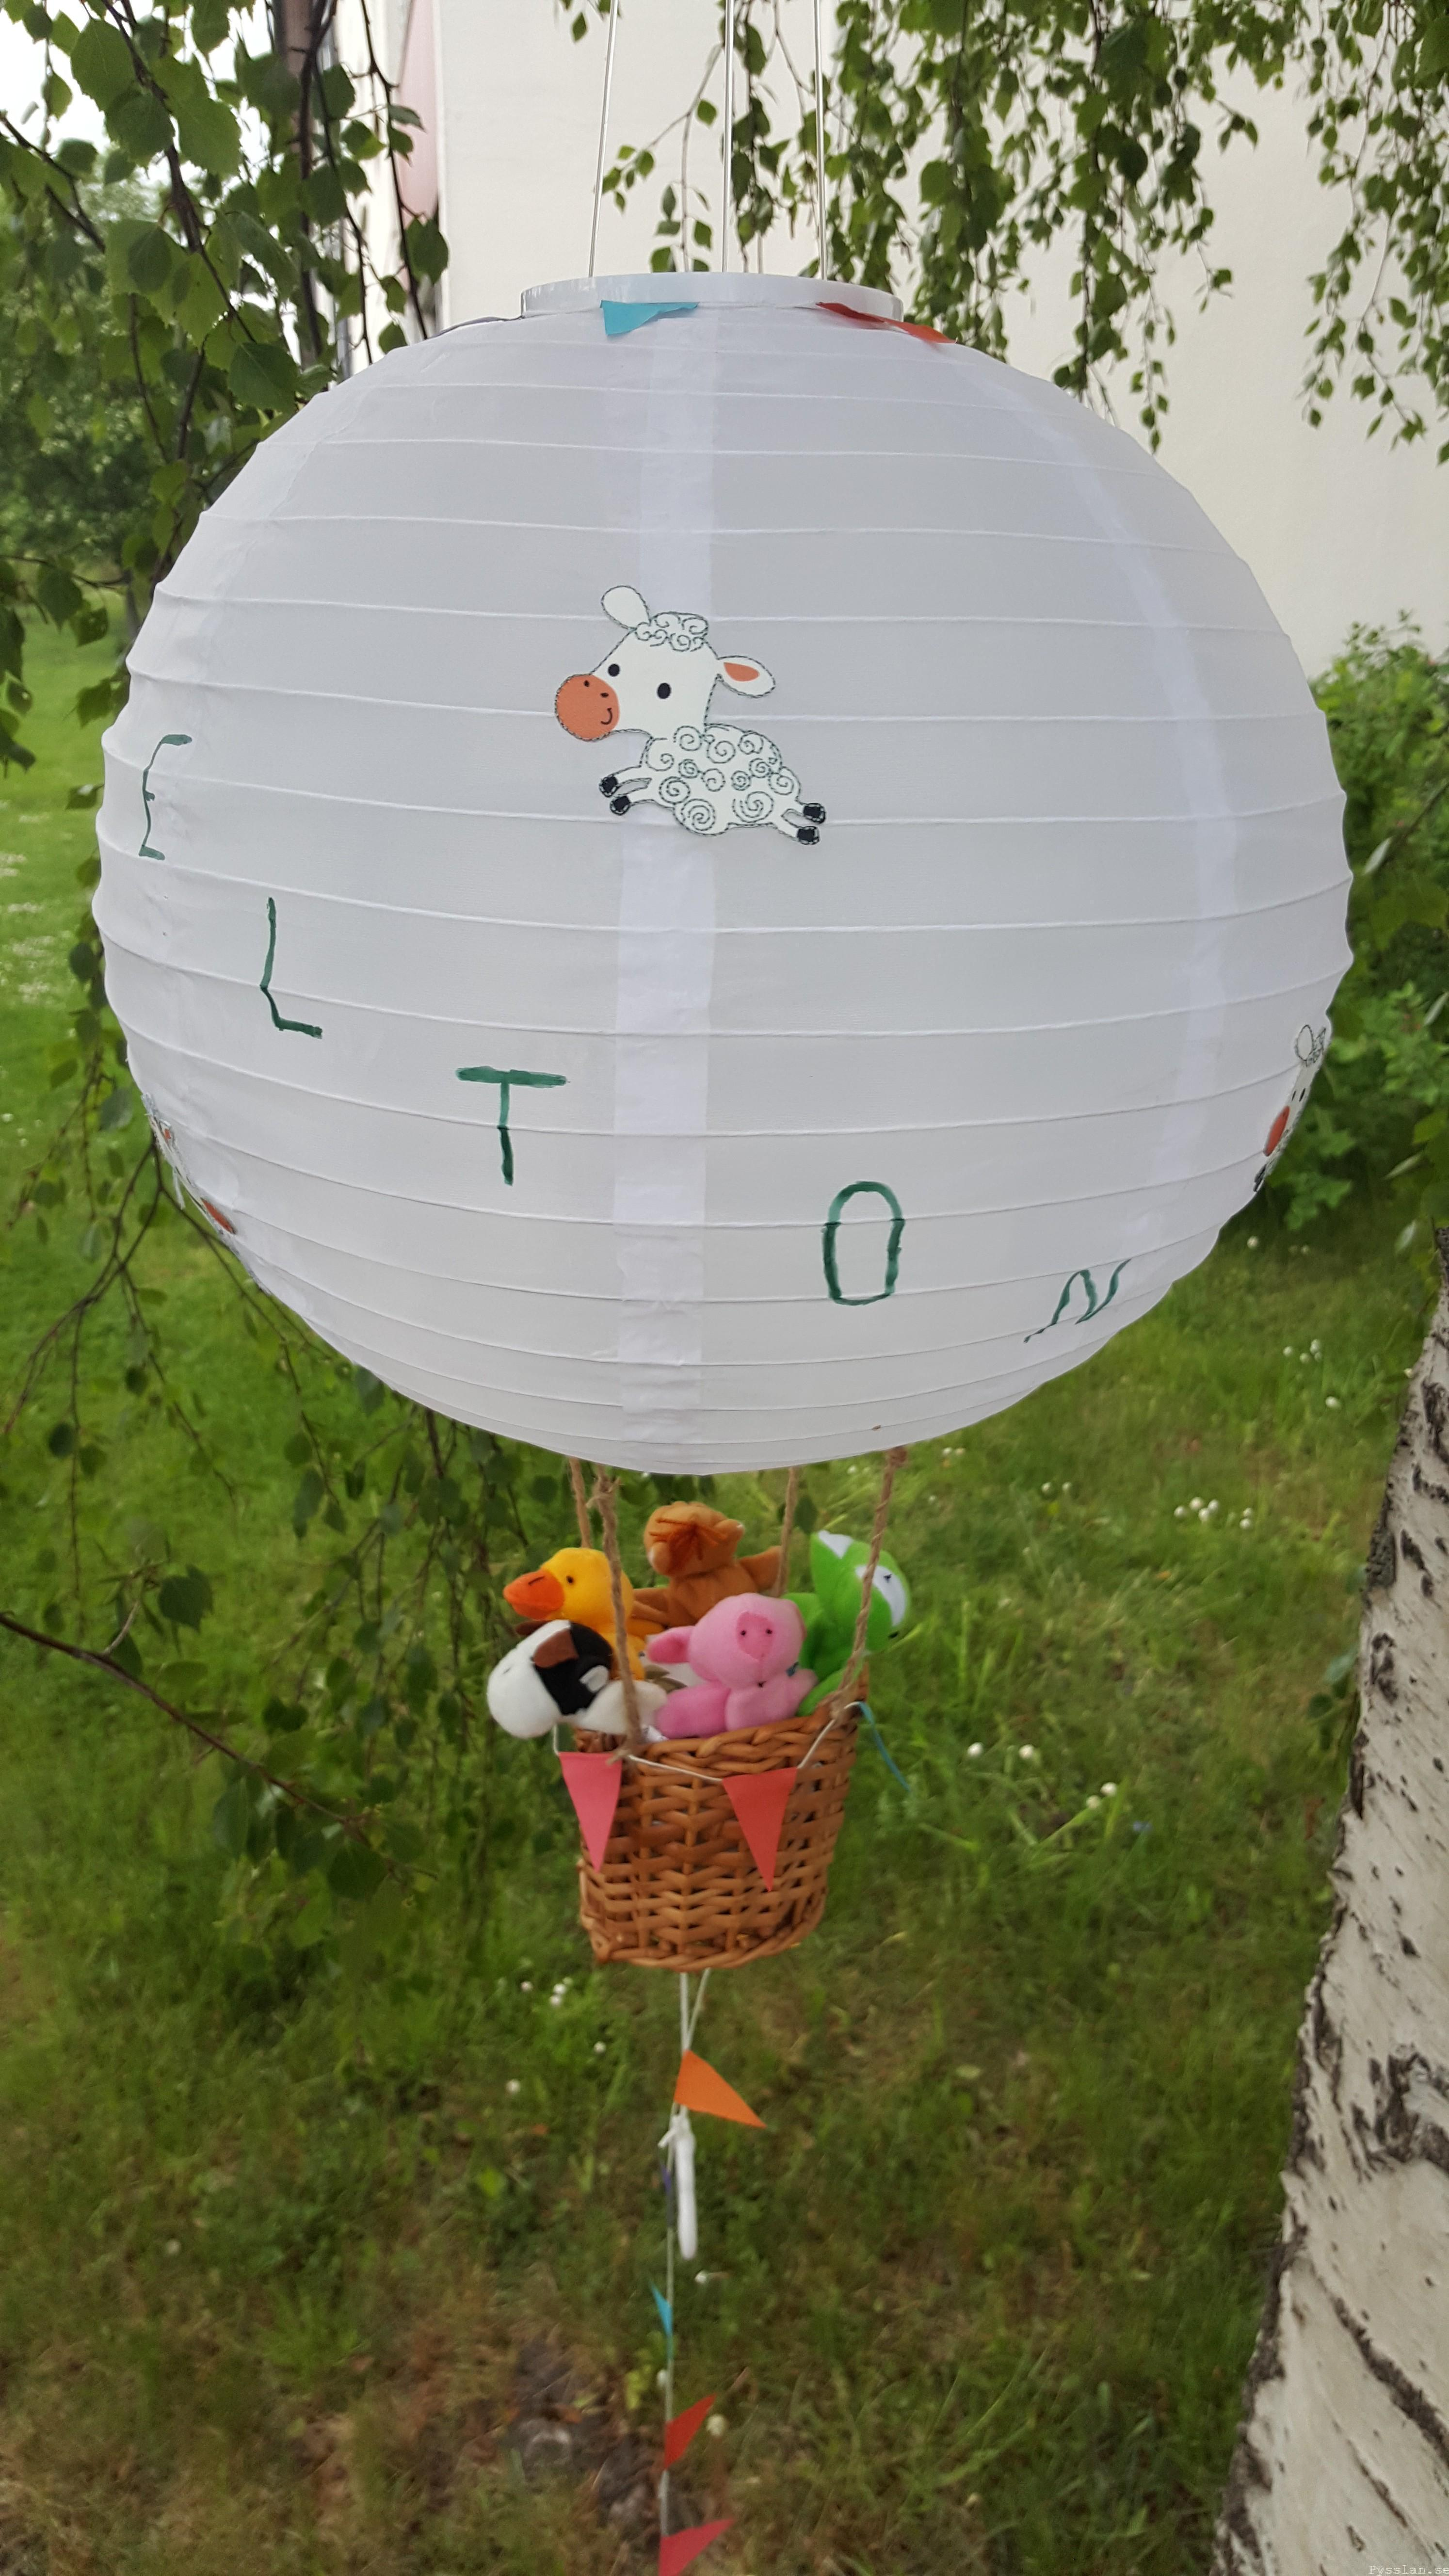 Luftballong doppresent baby speldosa pysslan blogg närbild